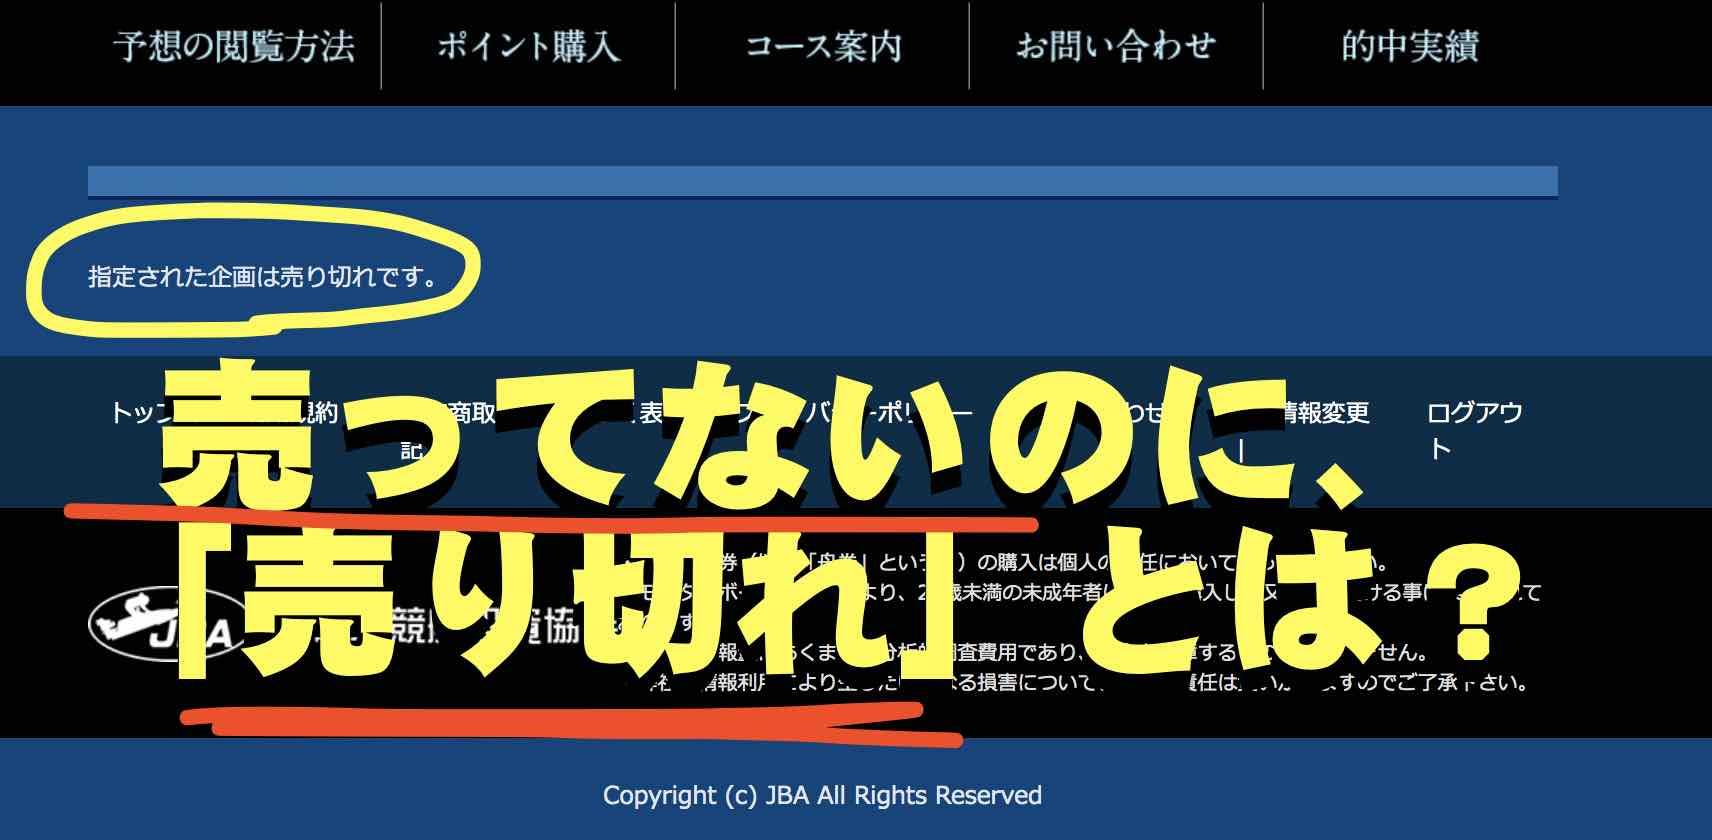 JBAという競艇予想サイトは売ってもいないのに売り切れか?